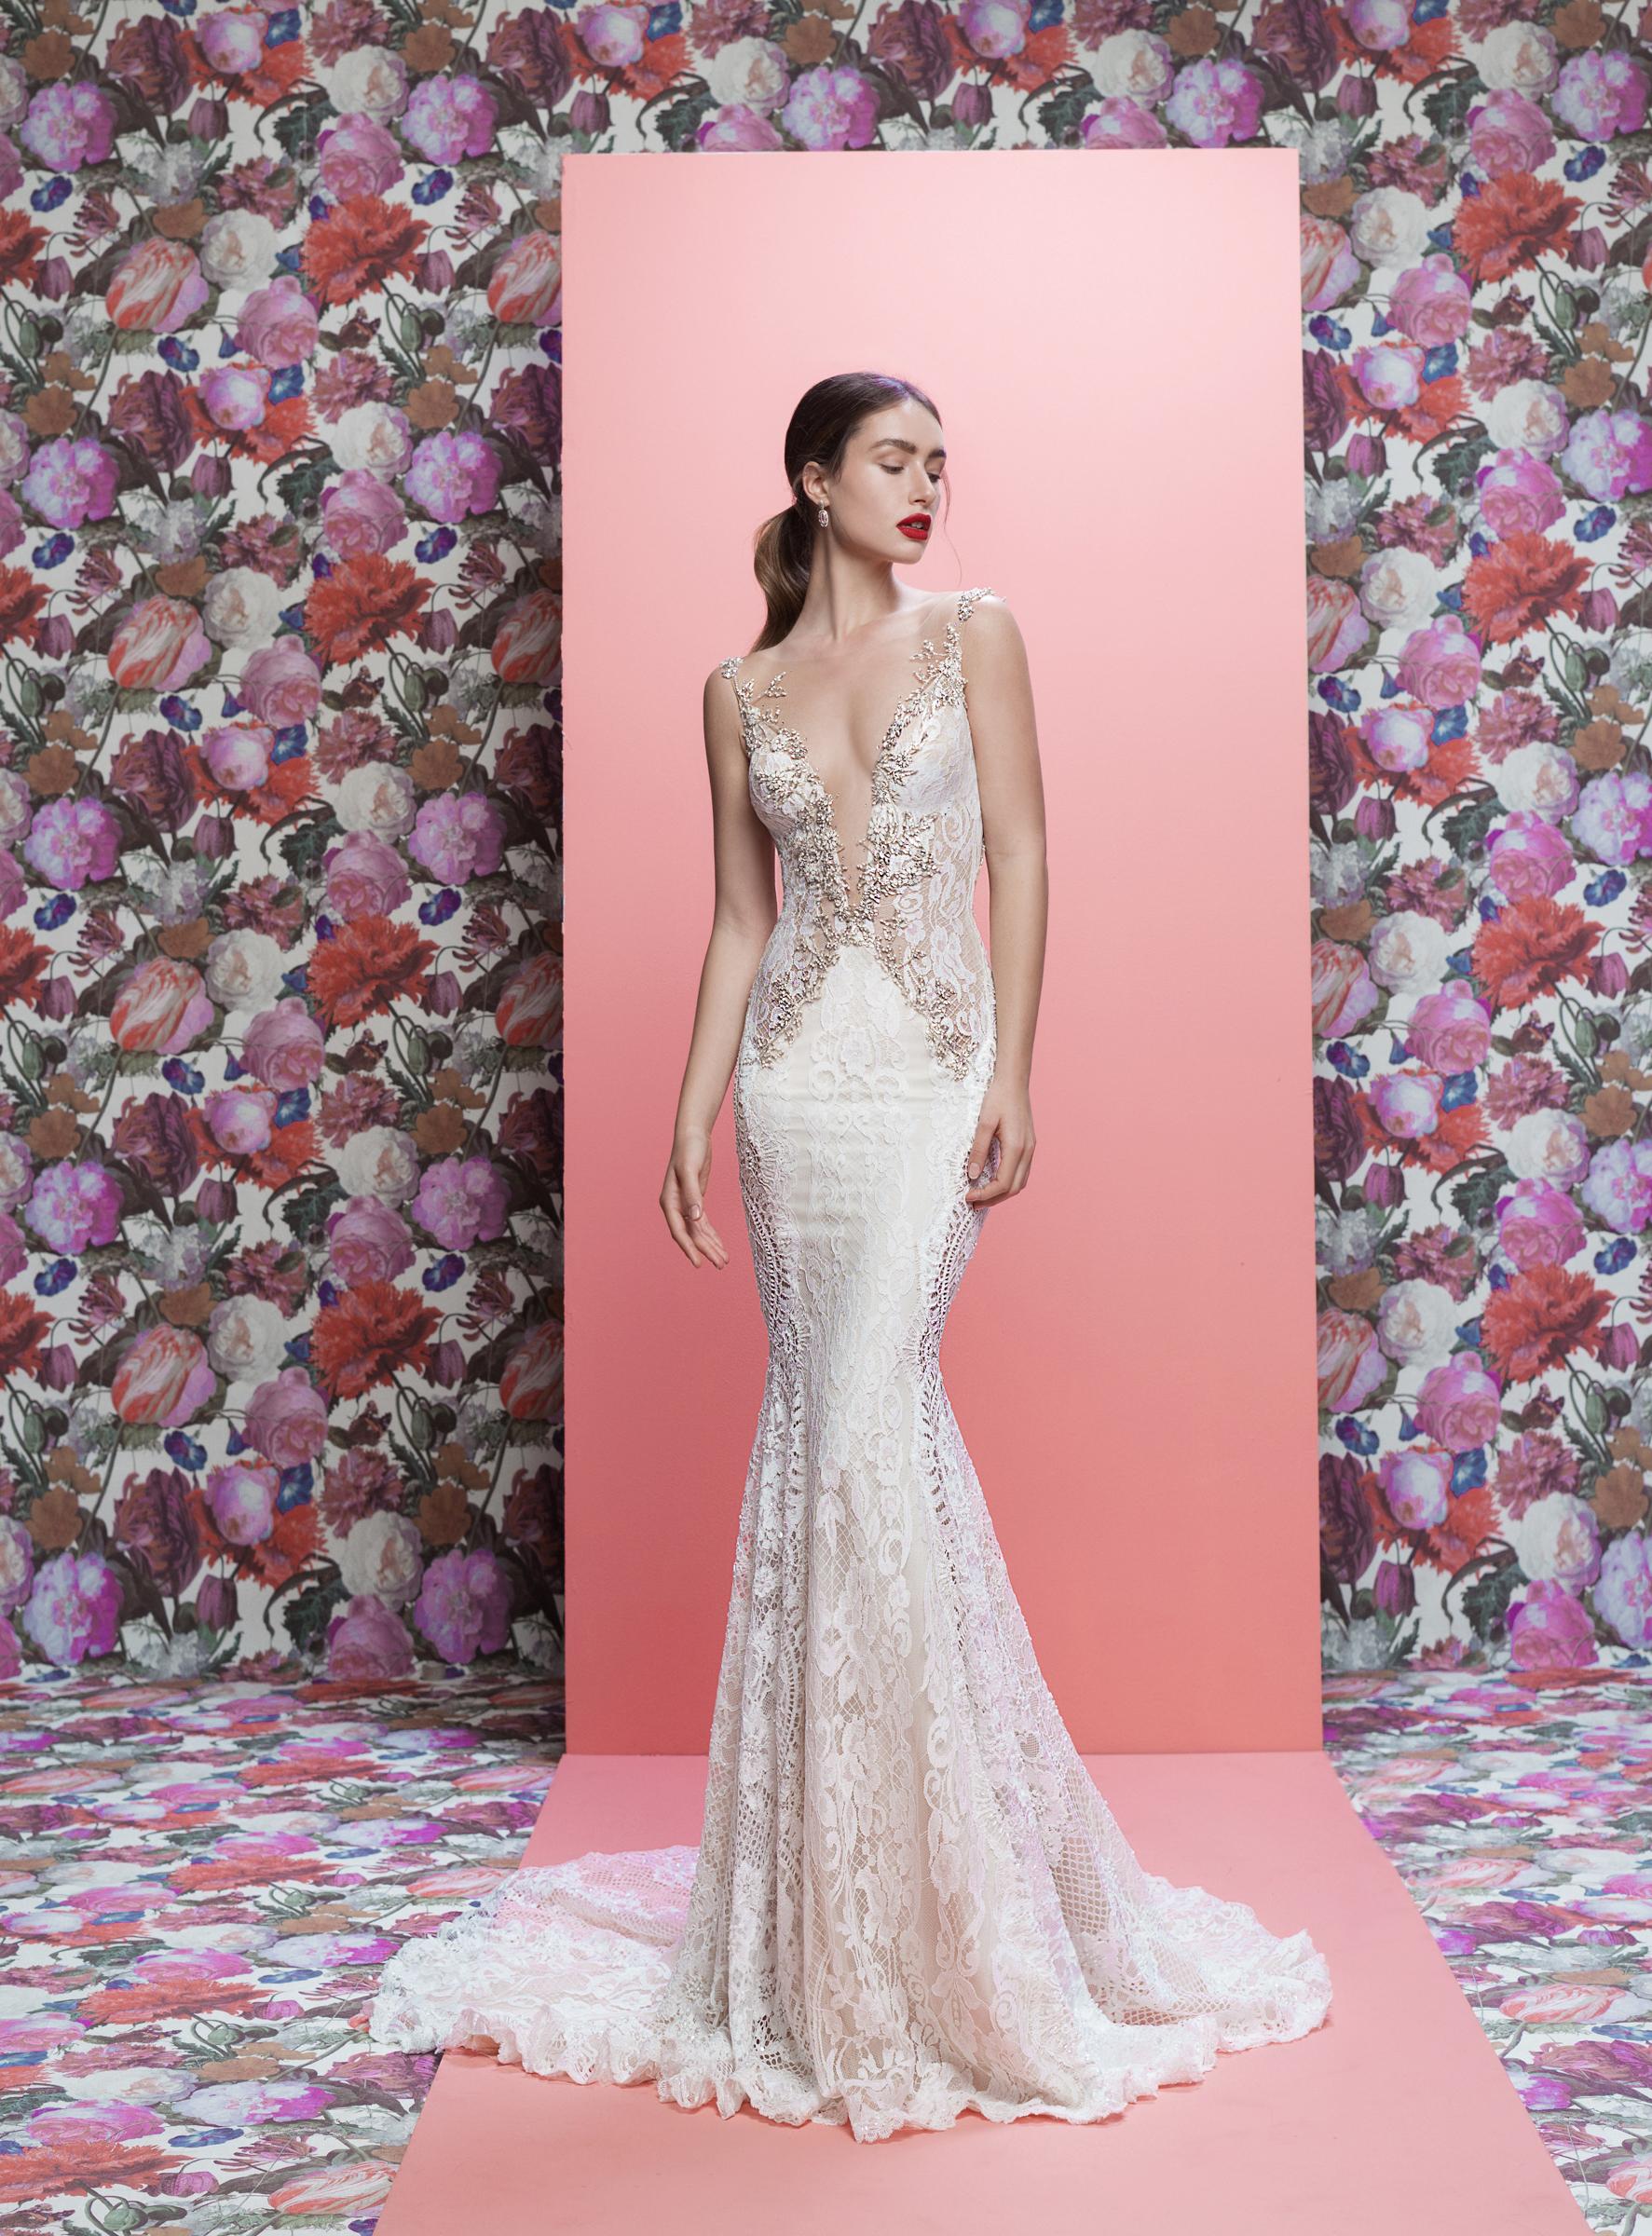 Galia Lahav wedding dress spring 2019 sparkly lace v-neck mermaid